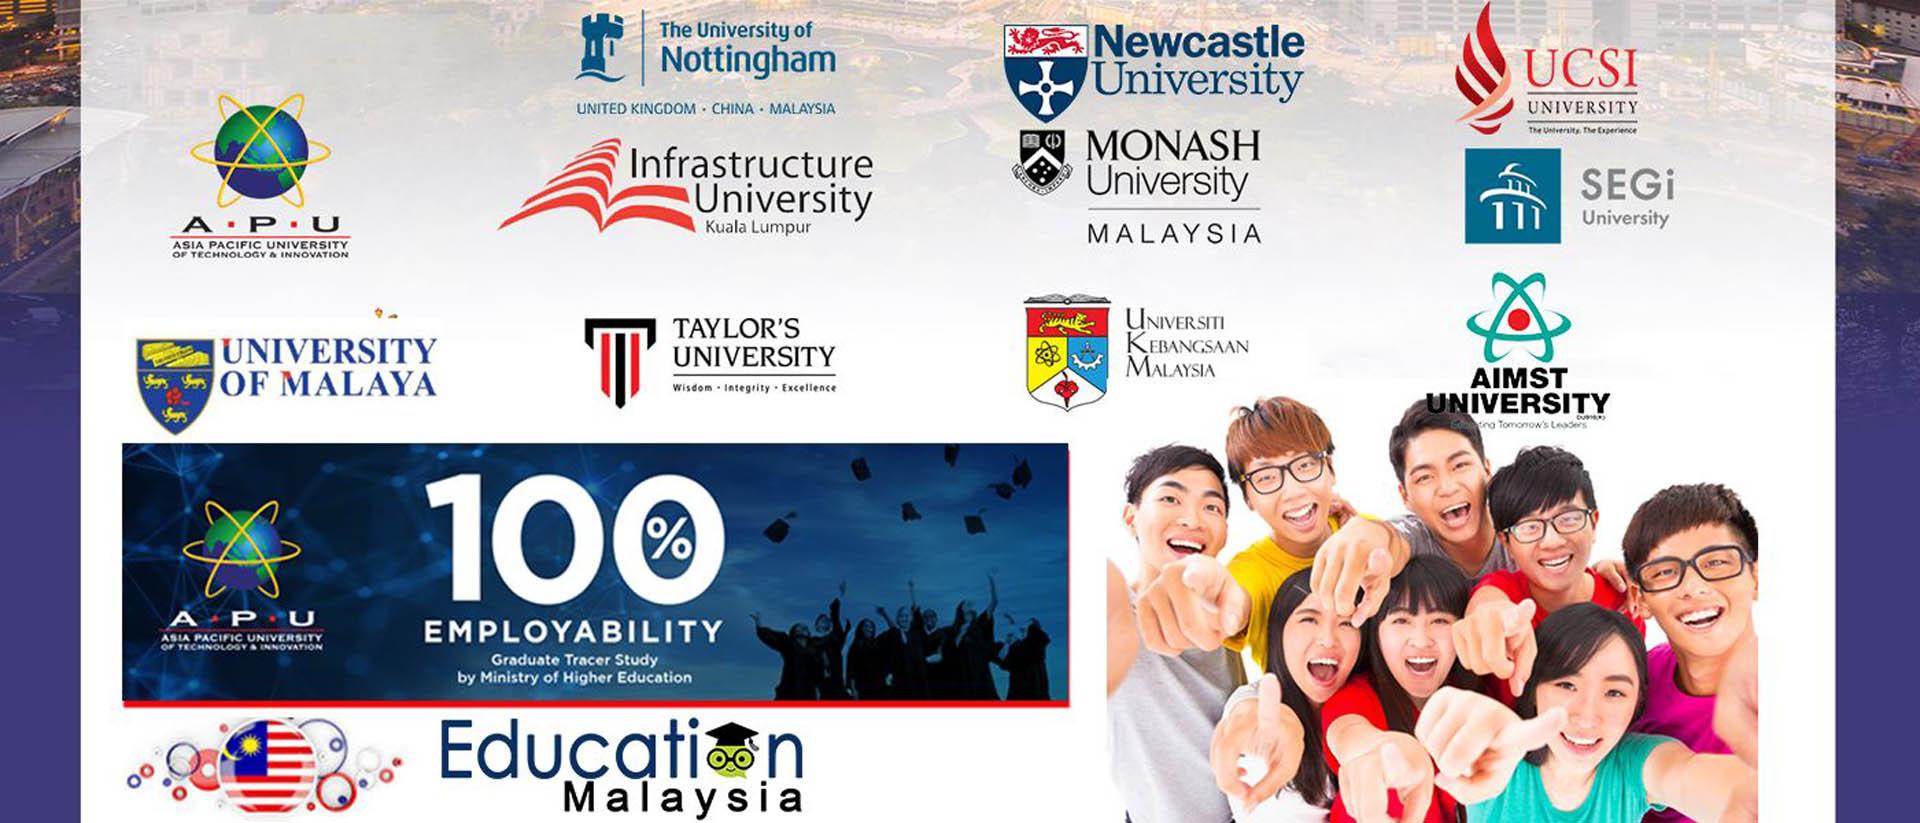 Study in Malaysia - Top Universities, Cost, Visa, Scholarships